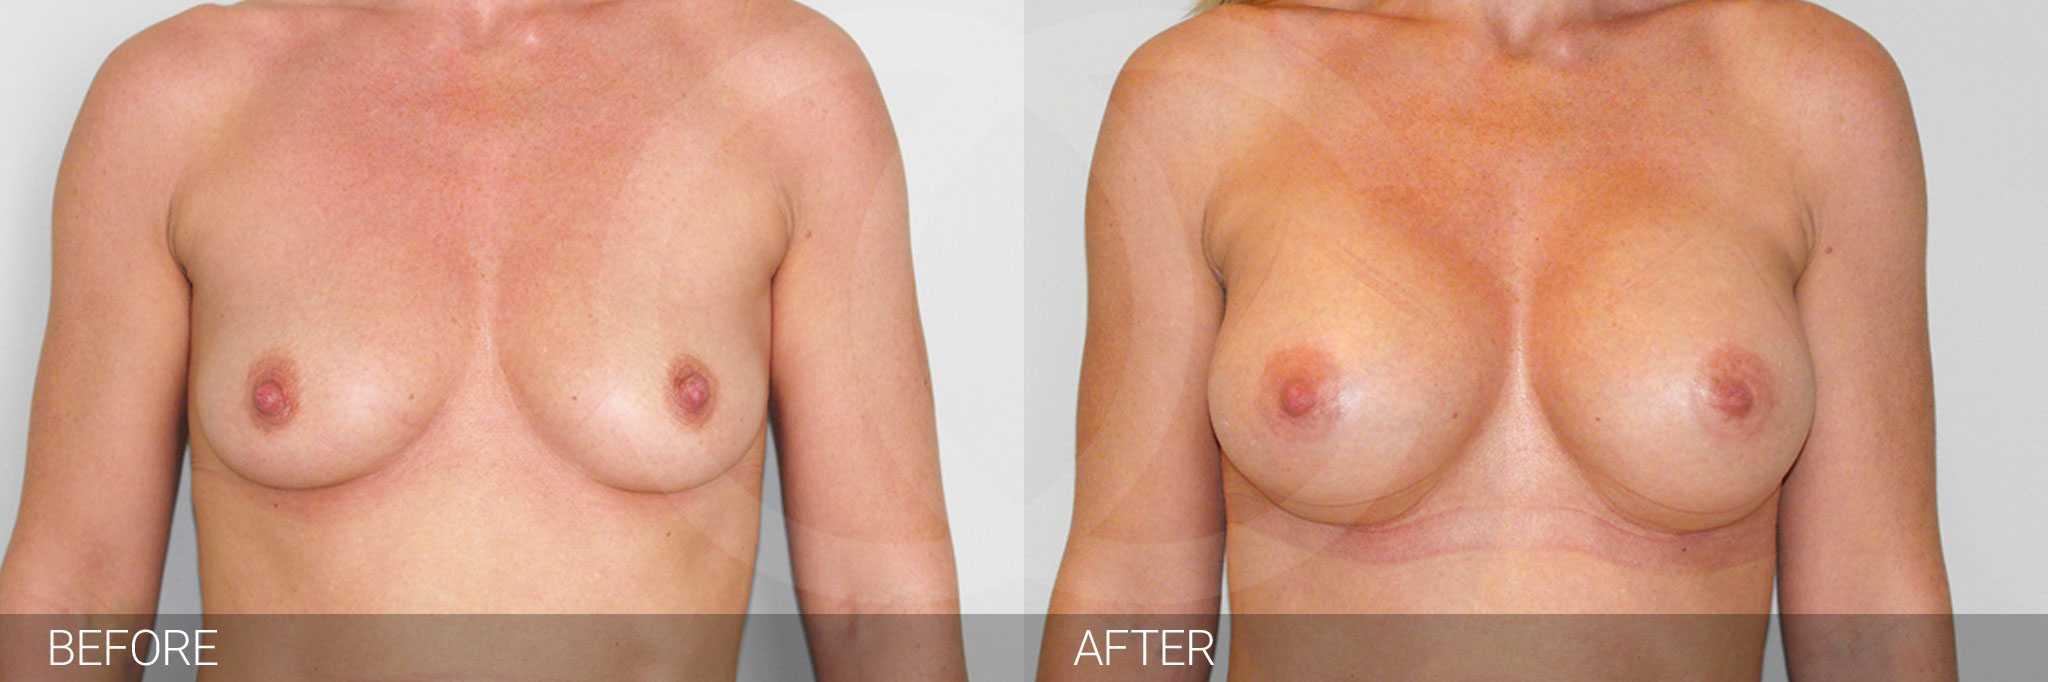 Brustvergrößerung Submuskuläre Implantatposition ante/post-op I